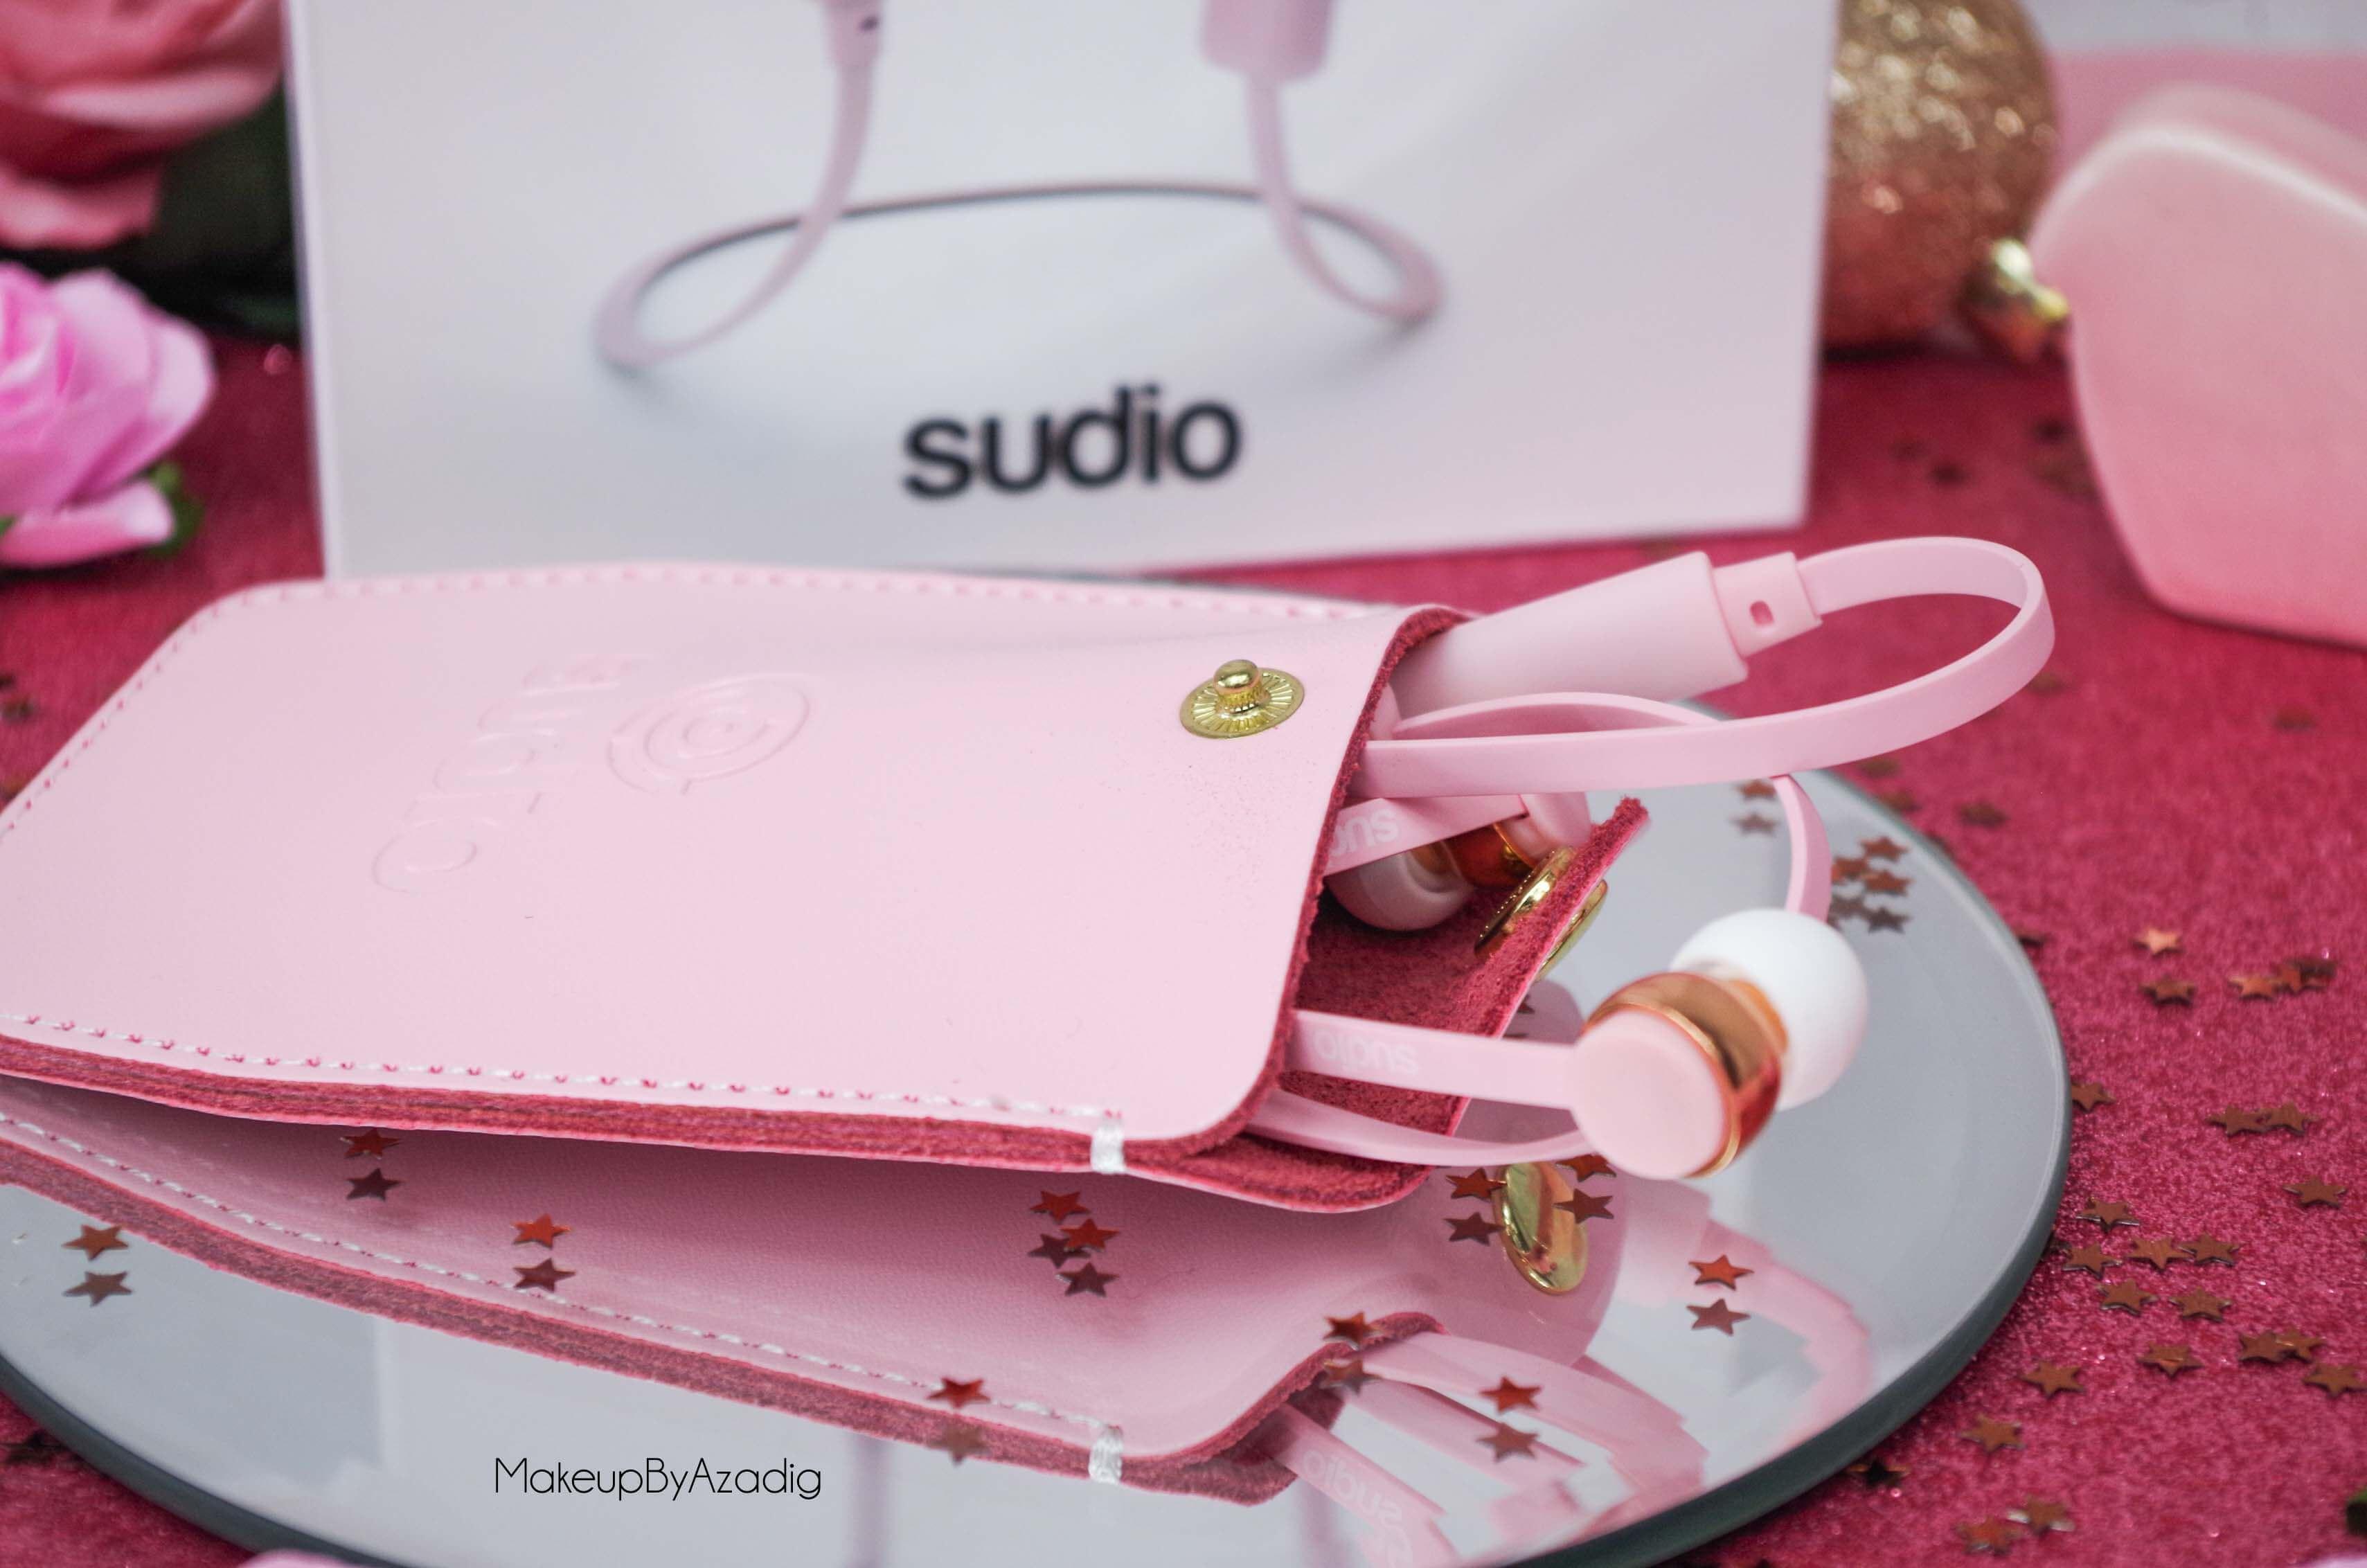 ecouteurs-casque-sans-fil-bluetooth-design-tendance-sudio-sweden-rose-vasa-bla-makeupbyazadig-avis-prix-cuir